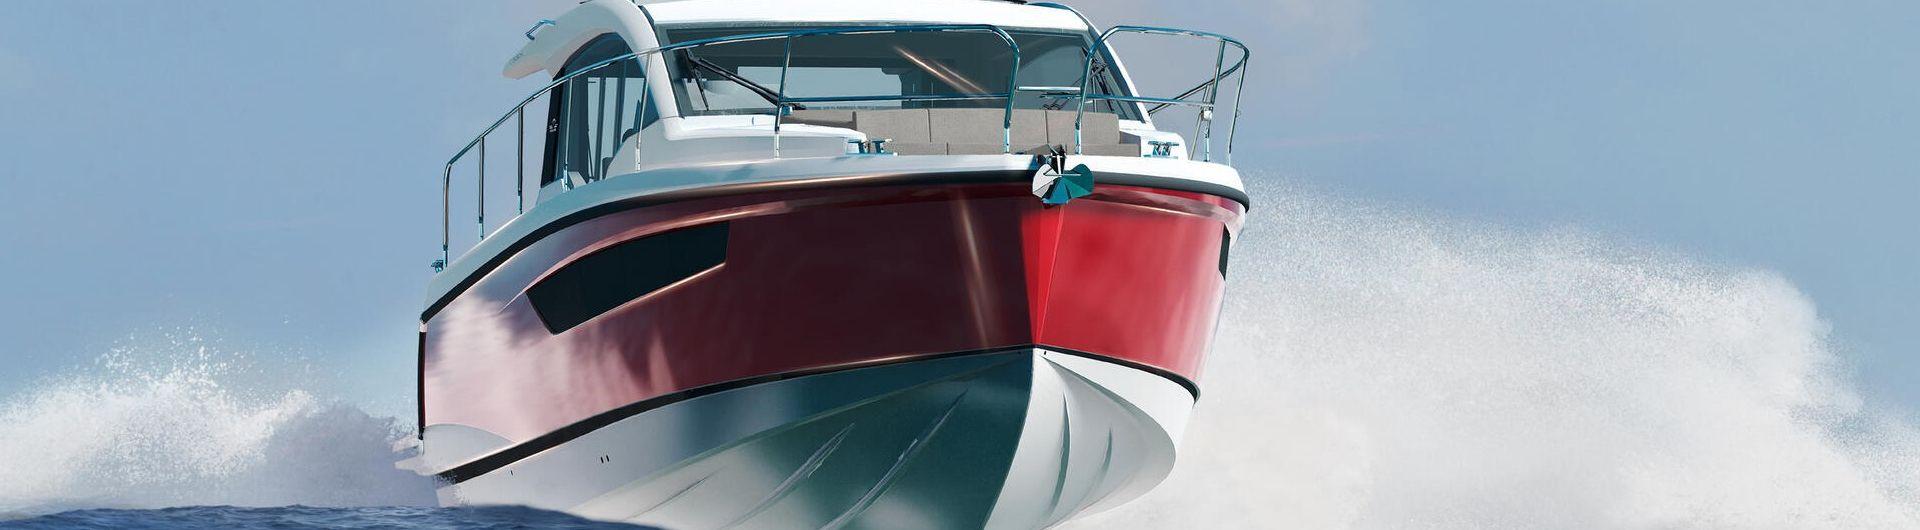 Sportboot Sealine C330v header